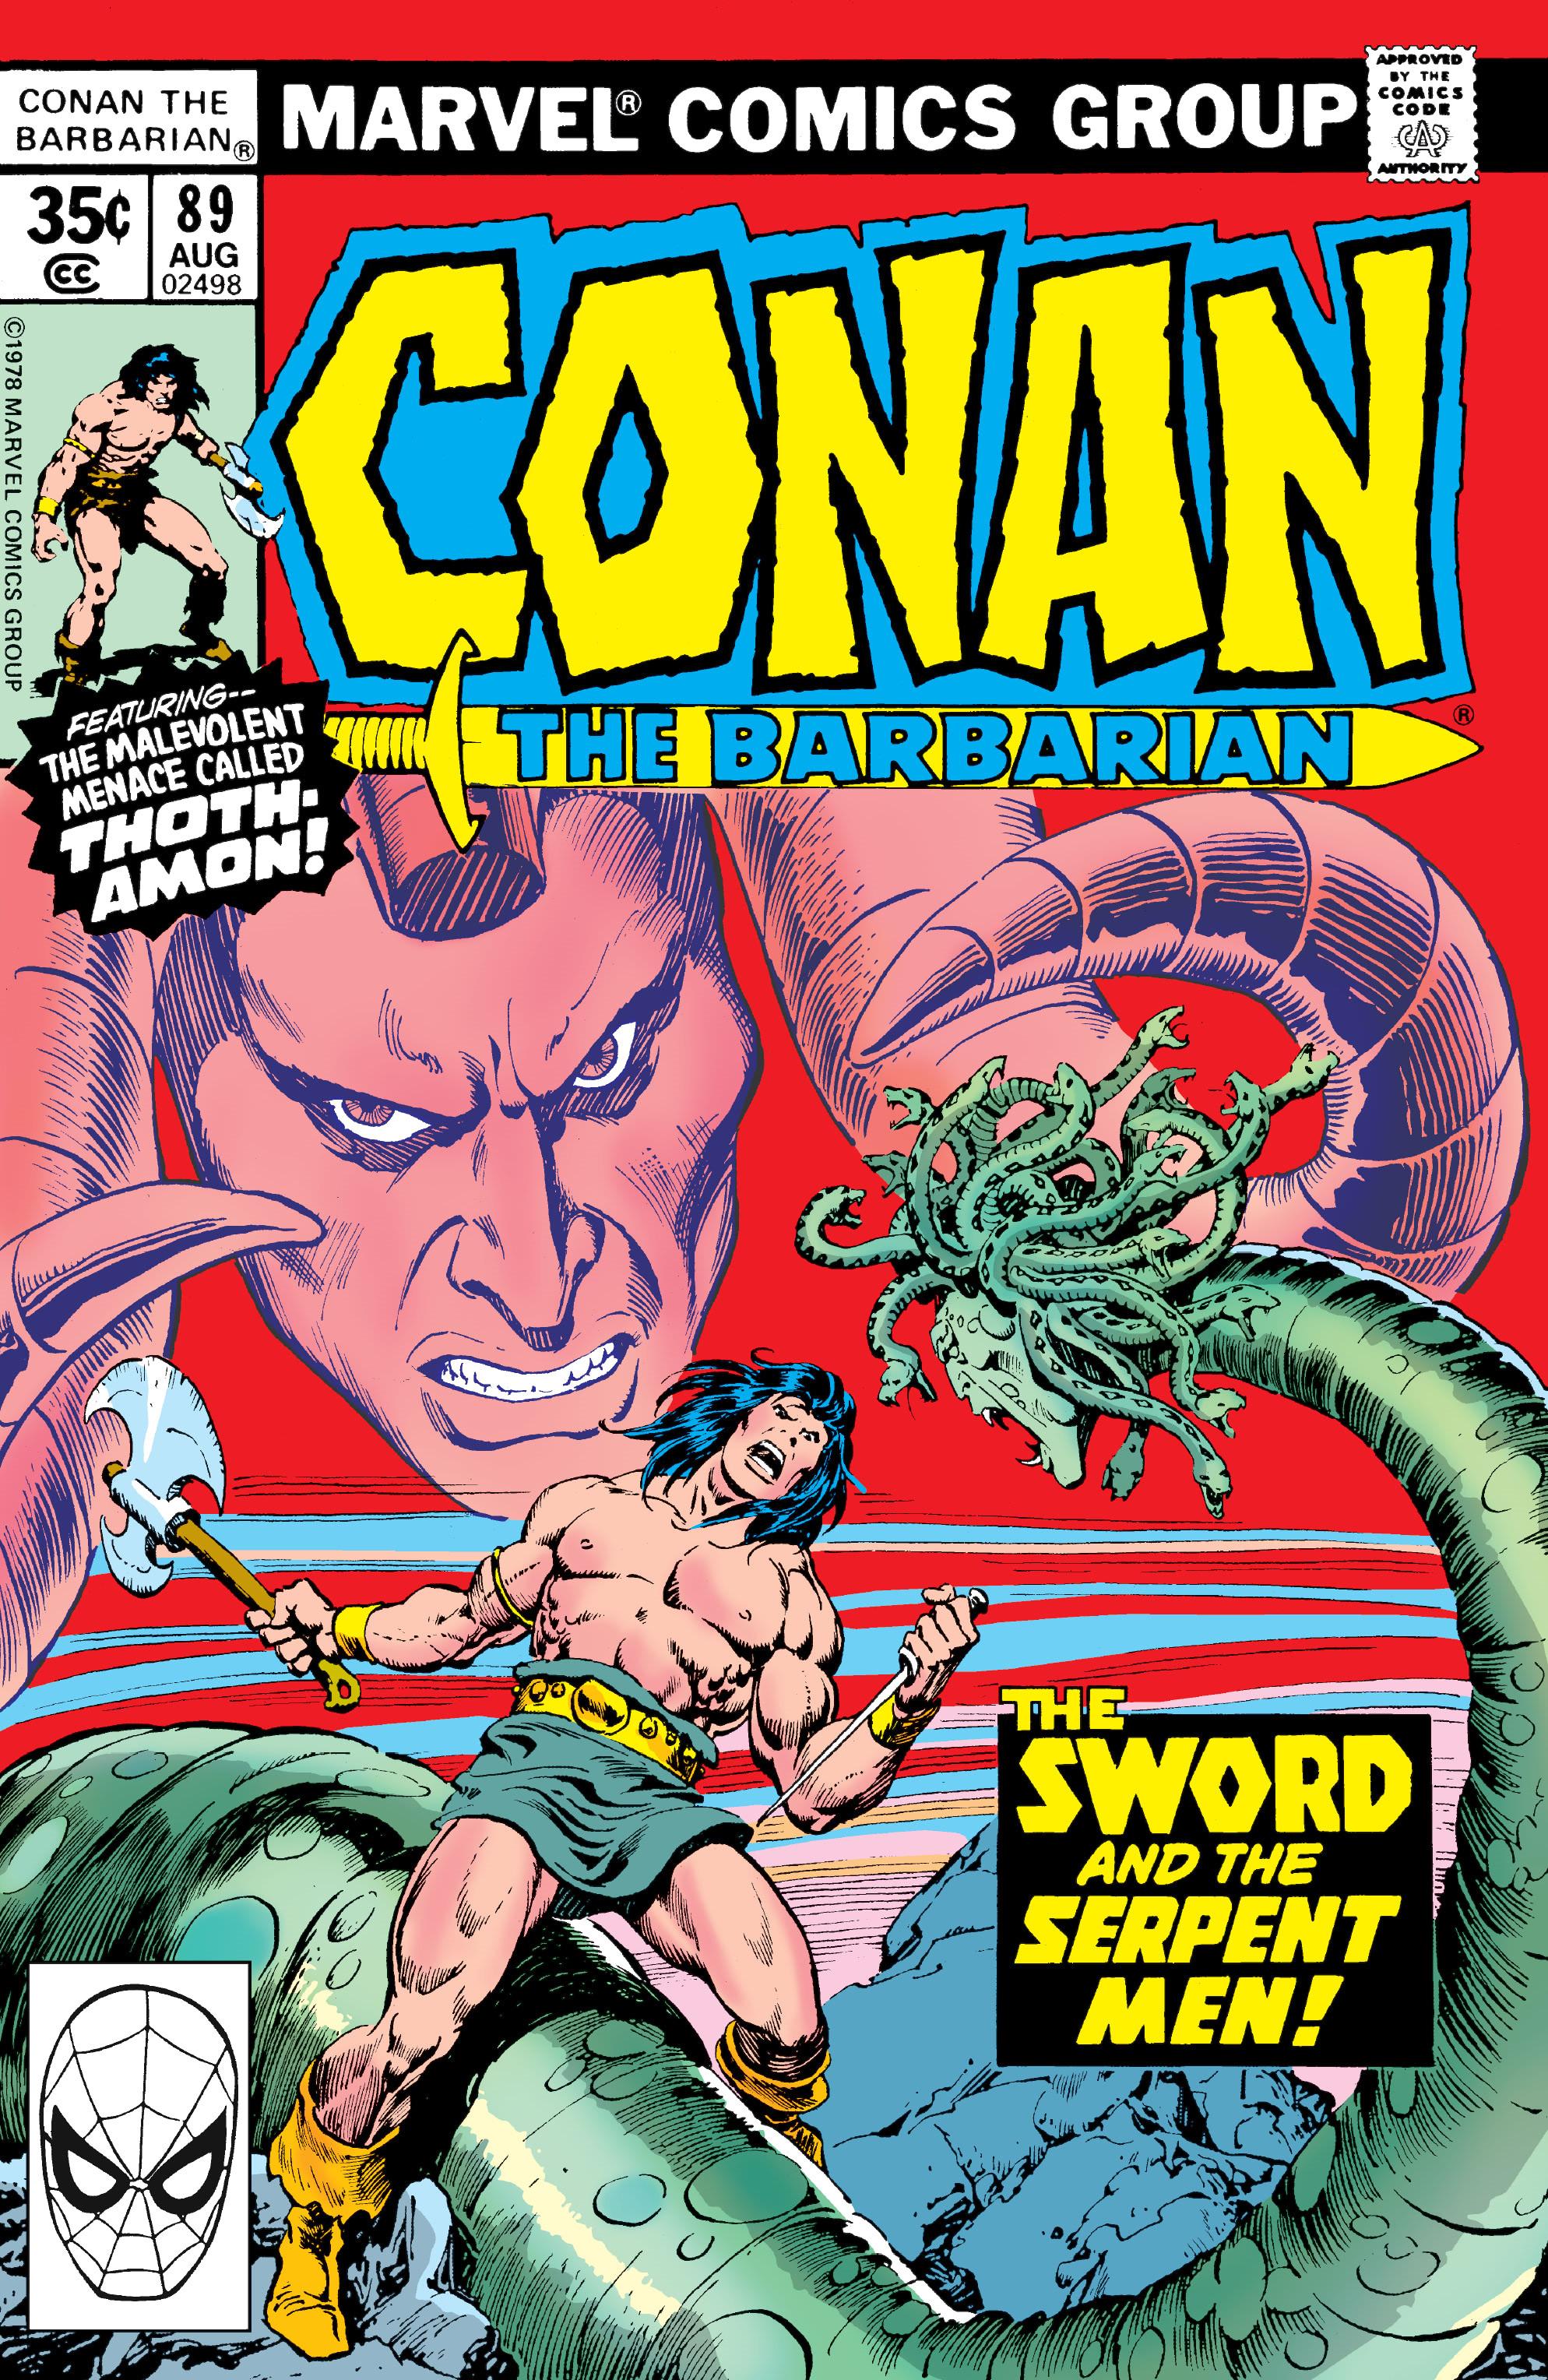 Conan the Barbarian Vol 1 89